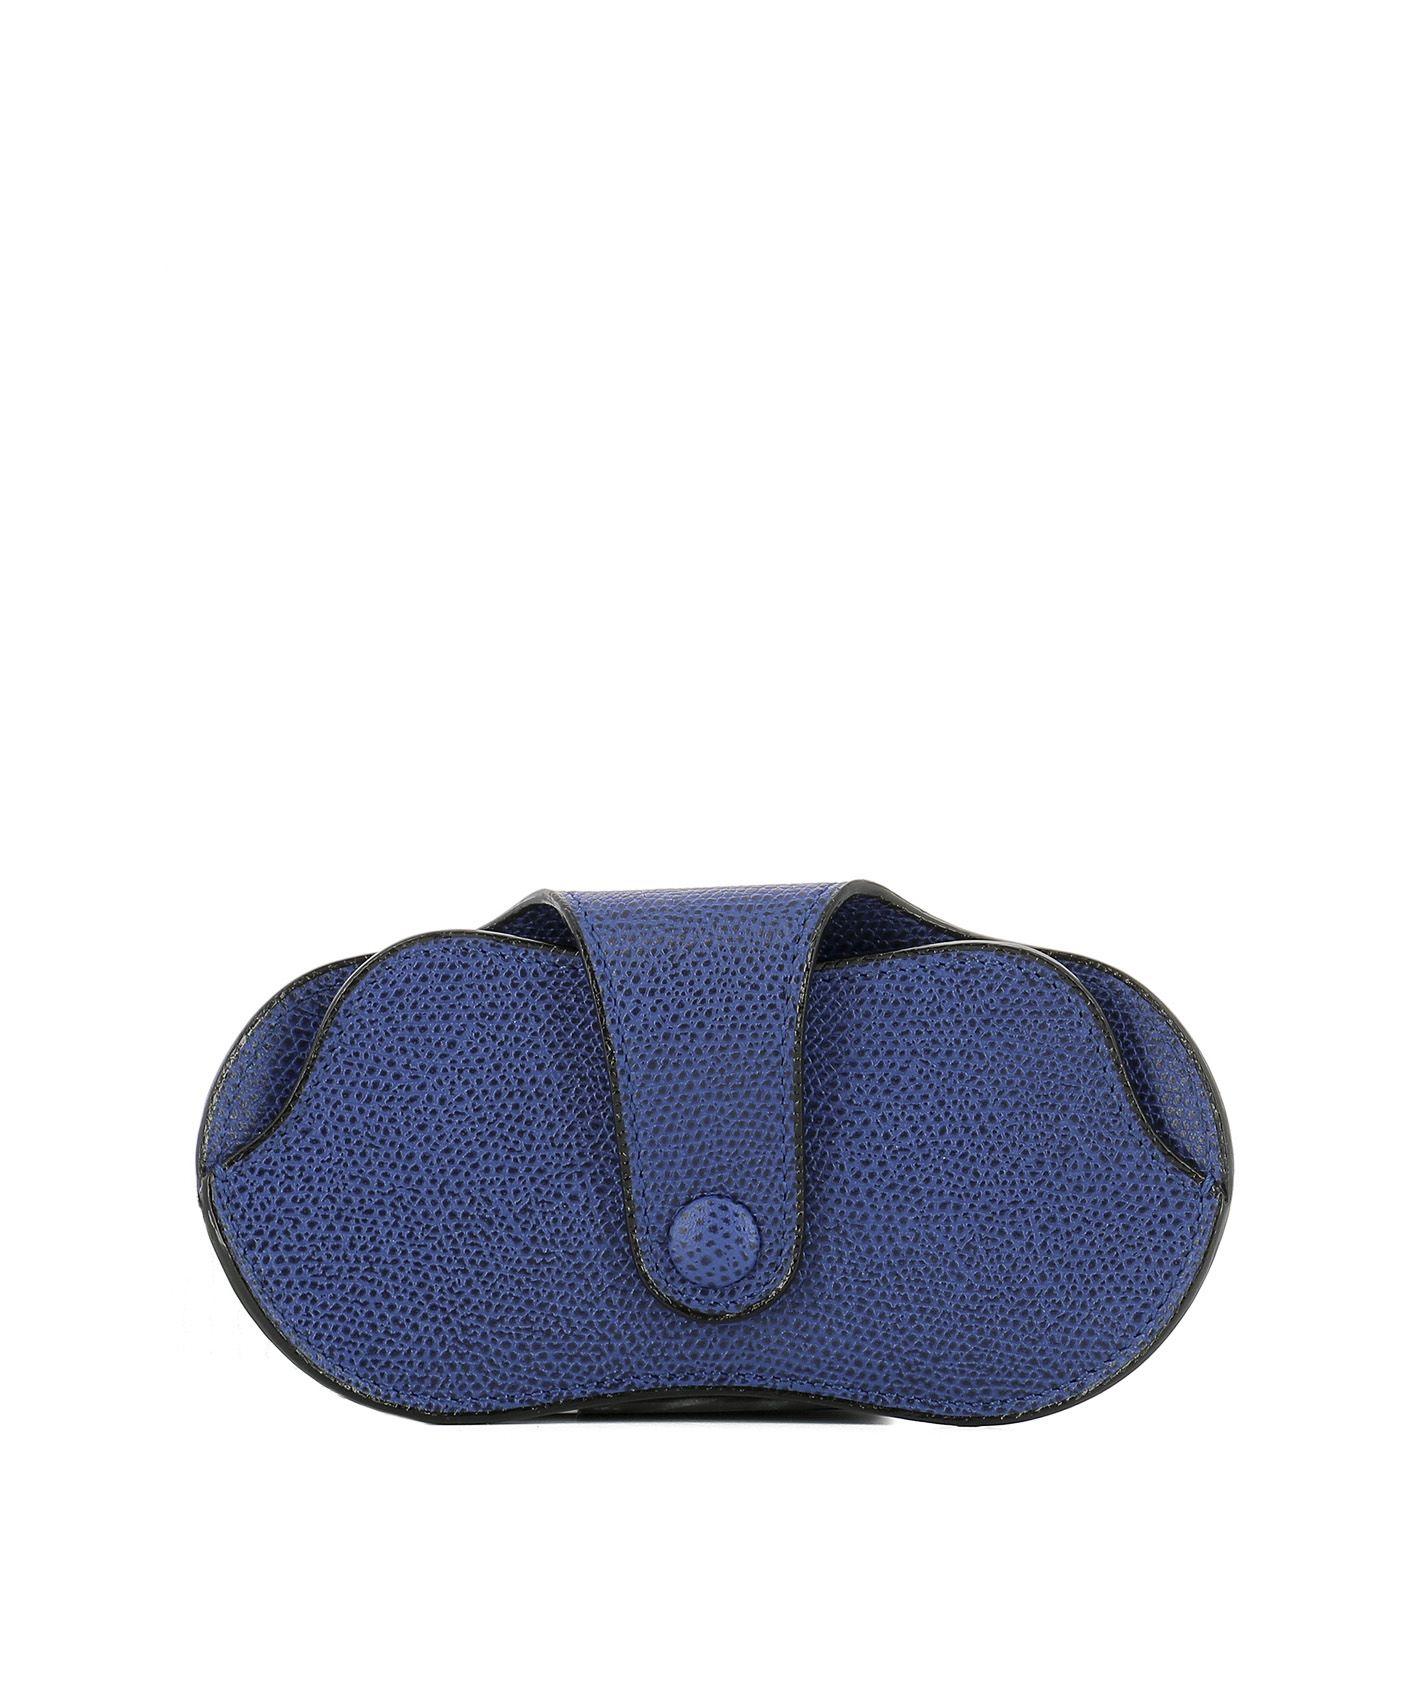 Blue Leather Eyeglasses Case 8361218